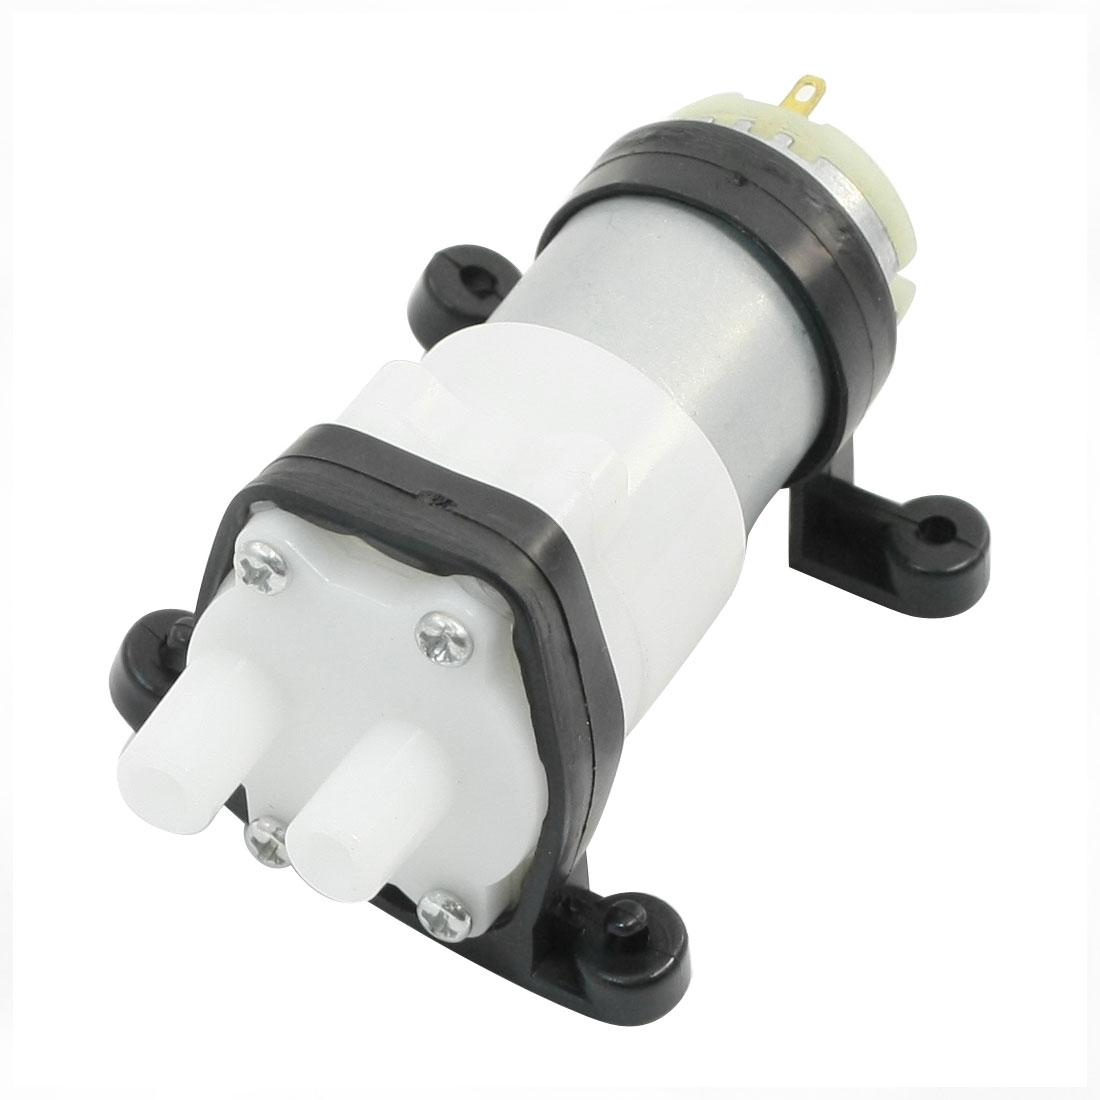 Compre priming diaphragm pump spray motor 12v para dispensador de compre priming diaphragm pump spray motor 12v para dispensador de gua de ux168clothing 796 ptdhgate ccuart Images